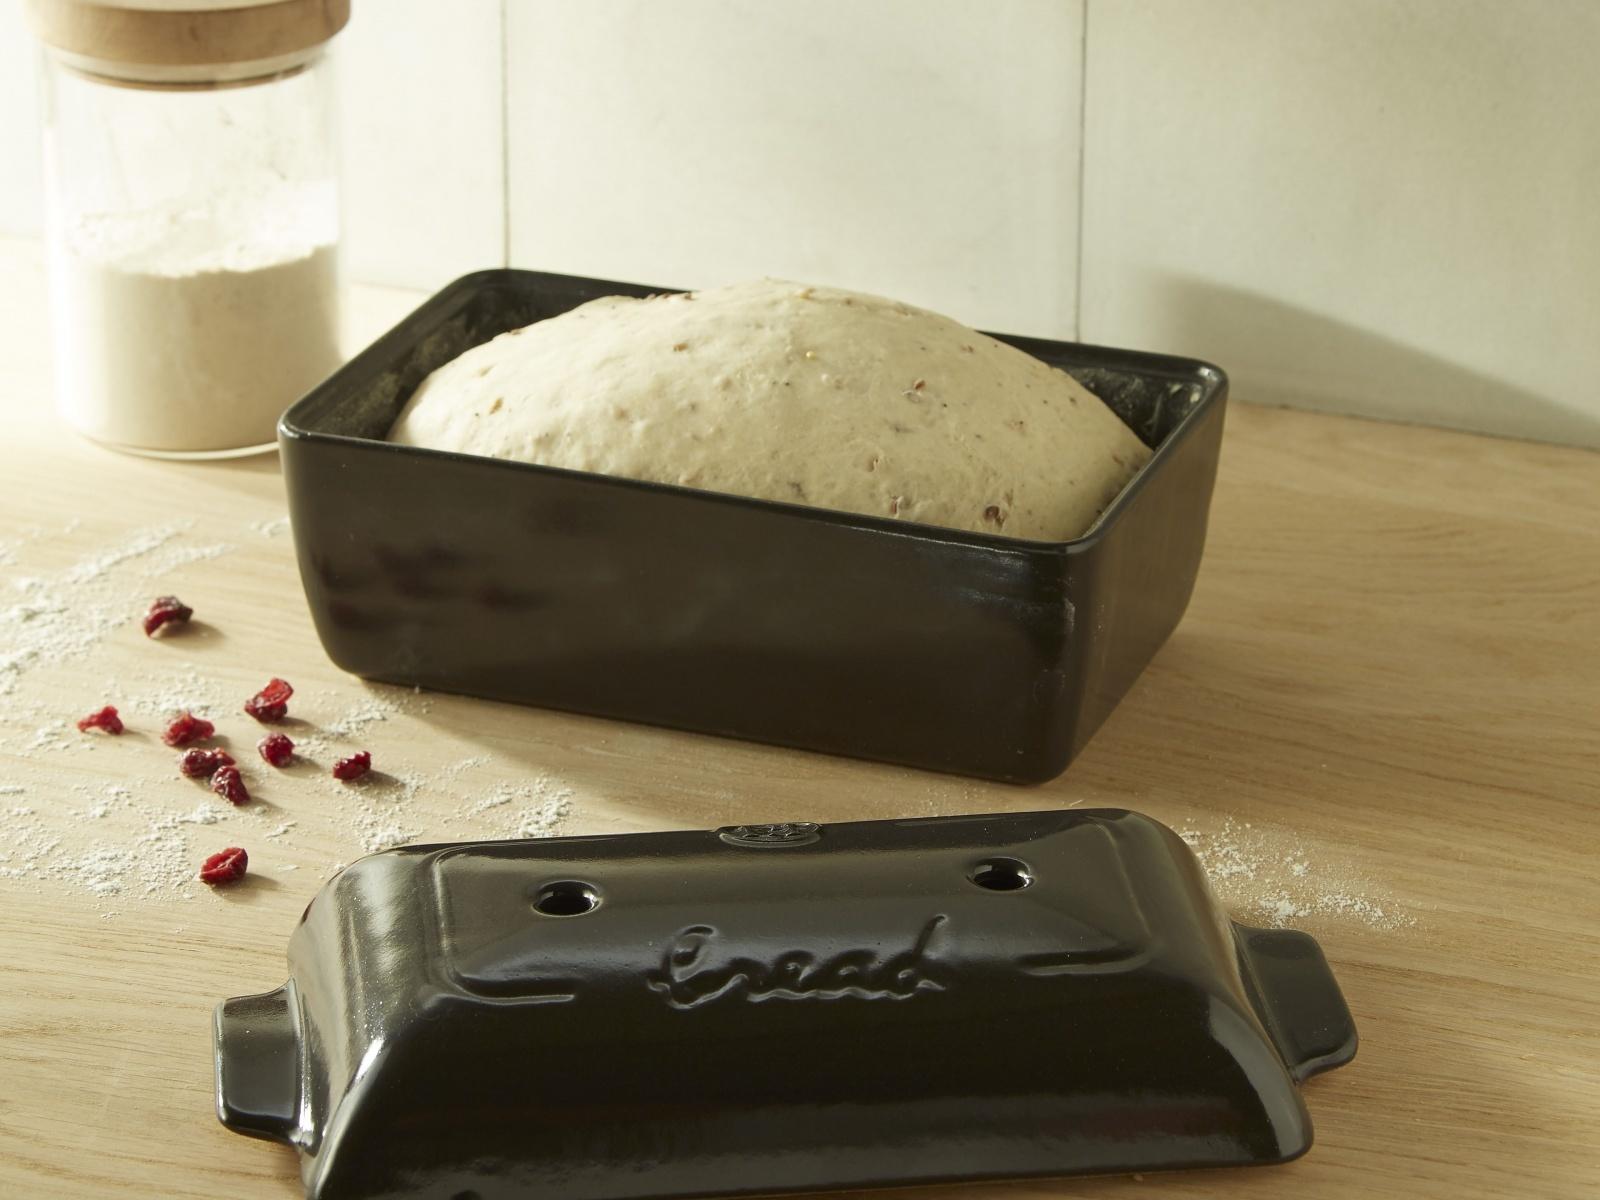 Форма для выпечки хлеба Emile Henry (базальт)